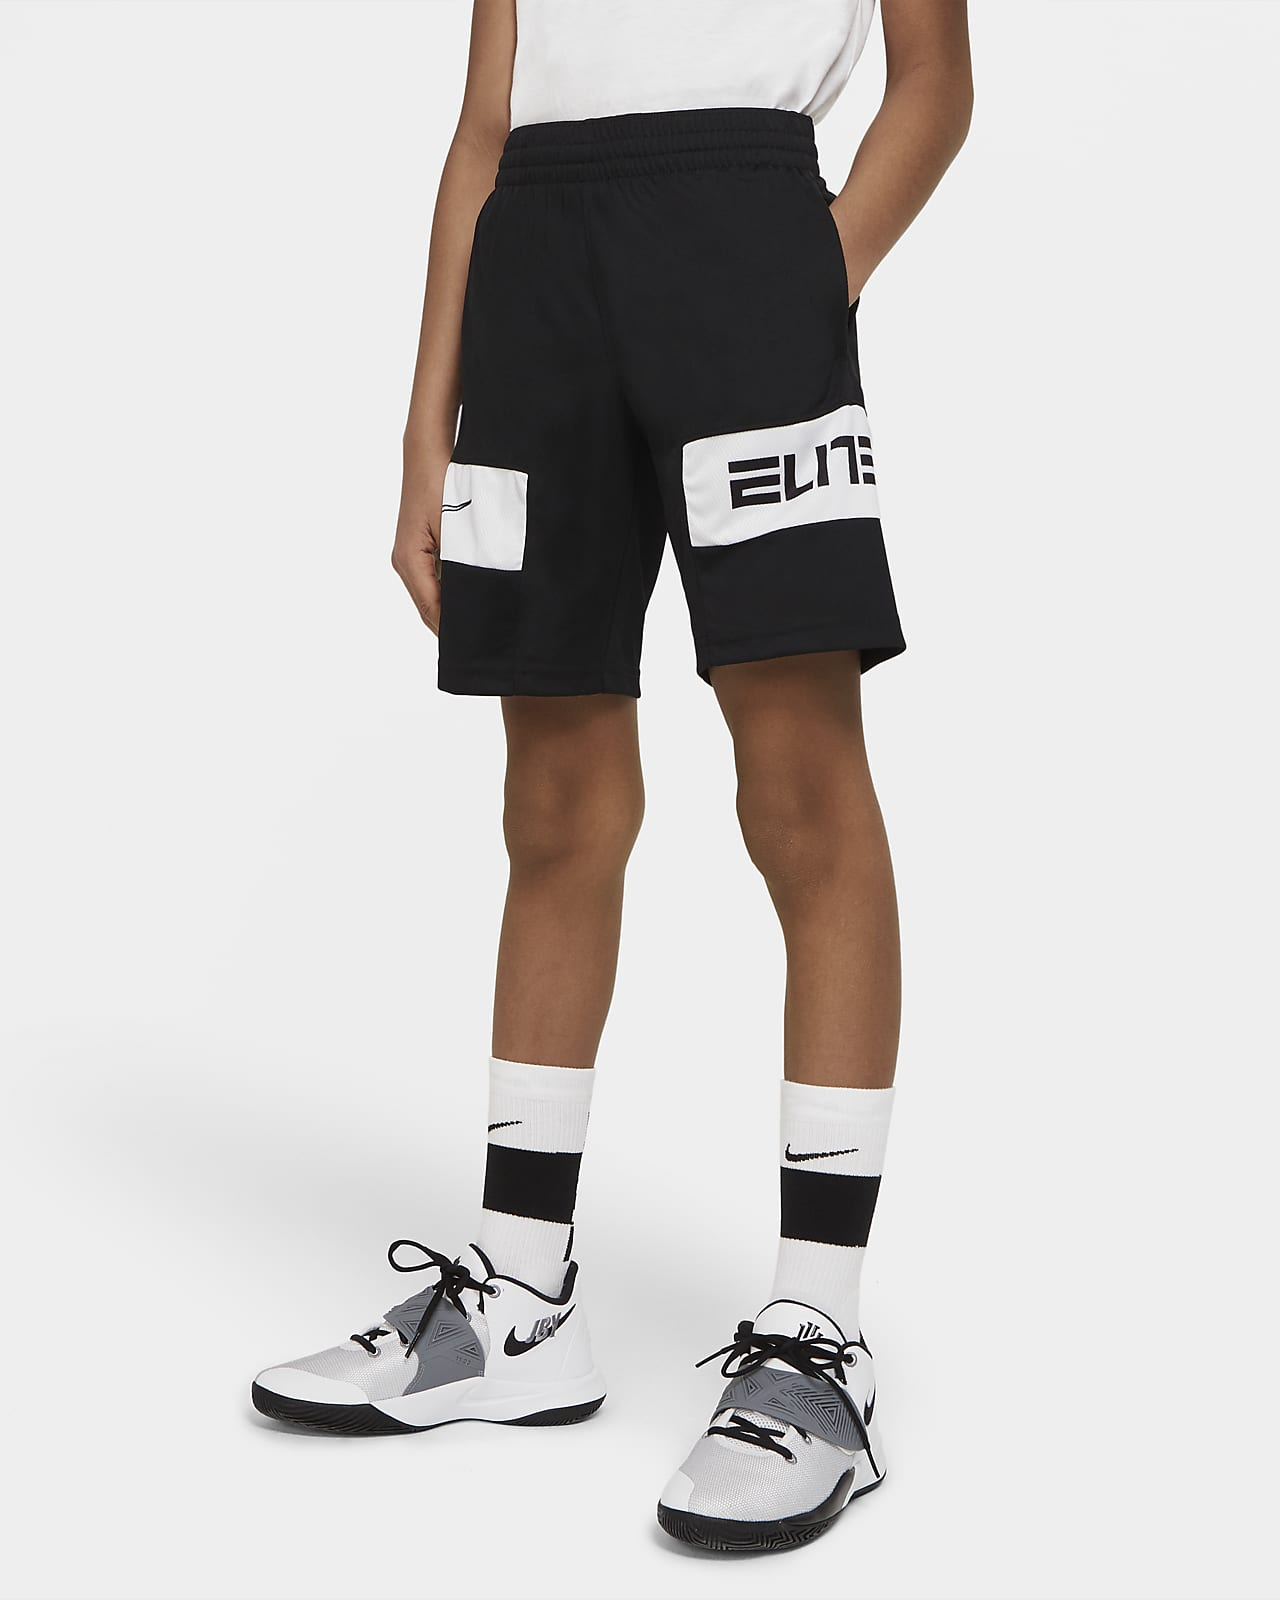 Nike Elite Big Kids' (Boys') Graphic Basketball Shorts